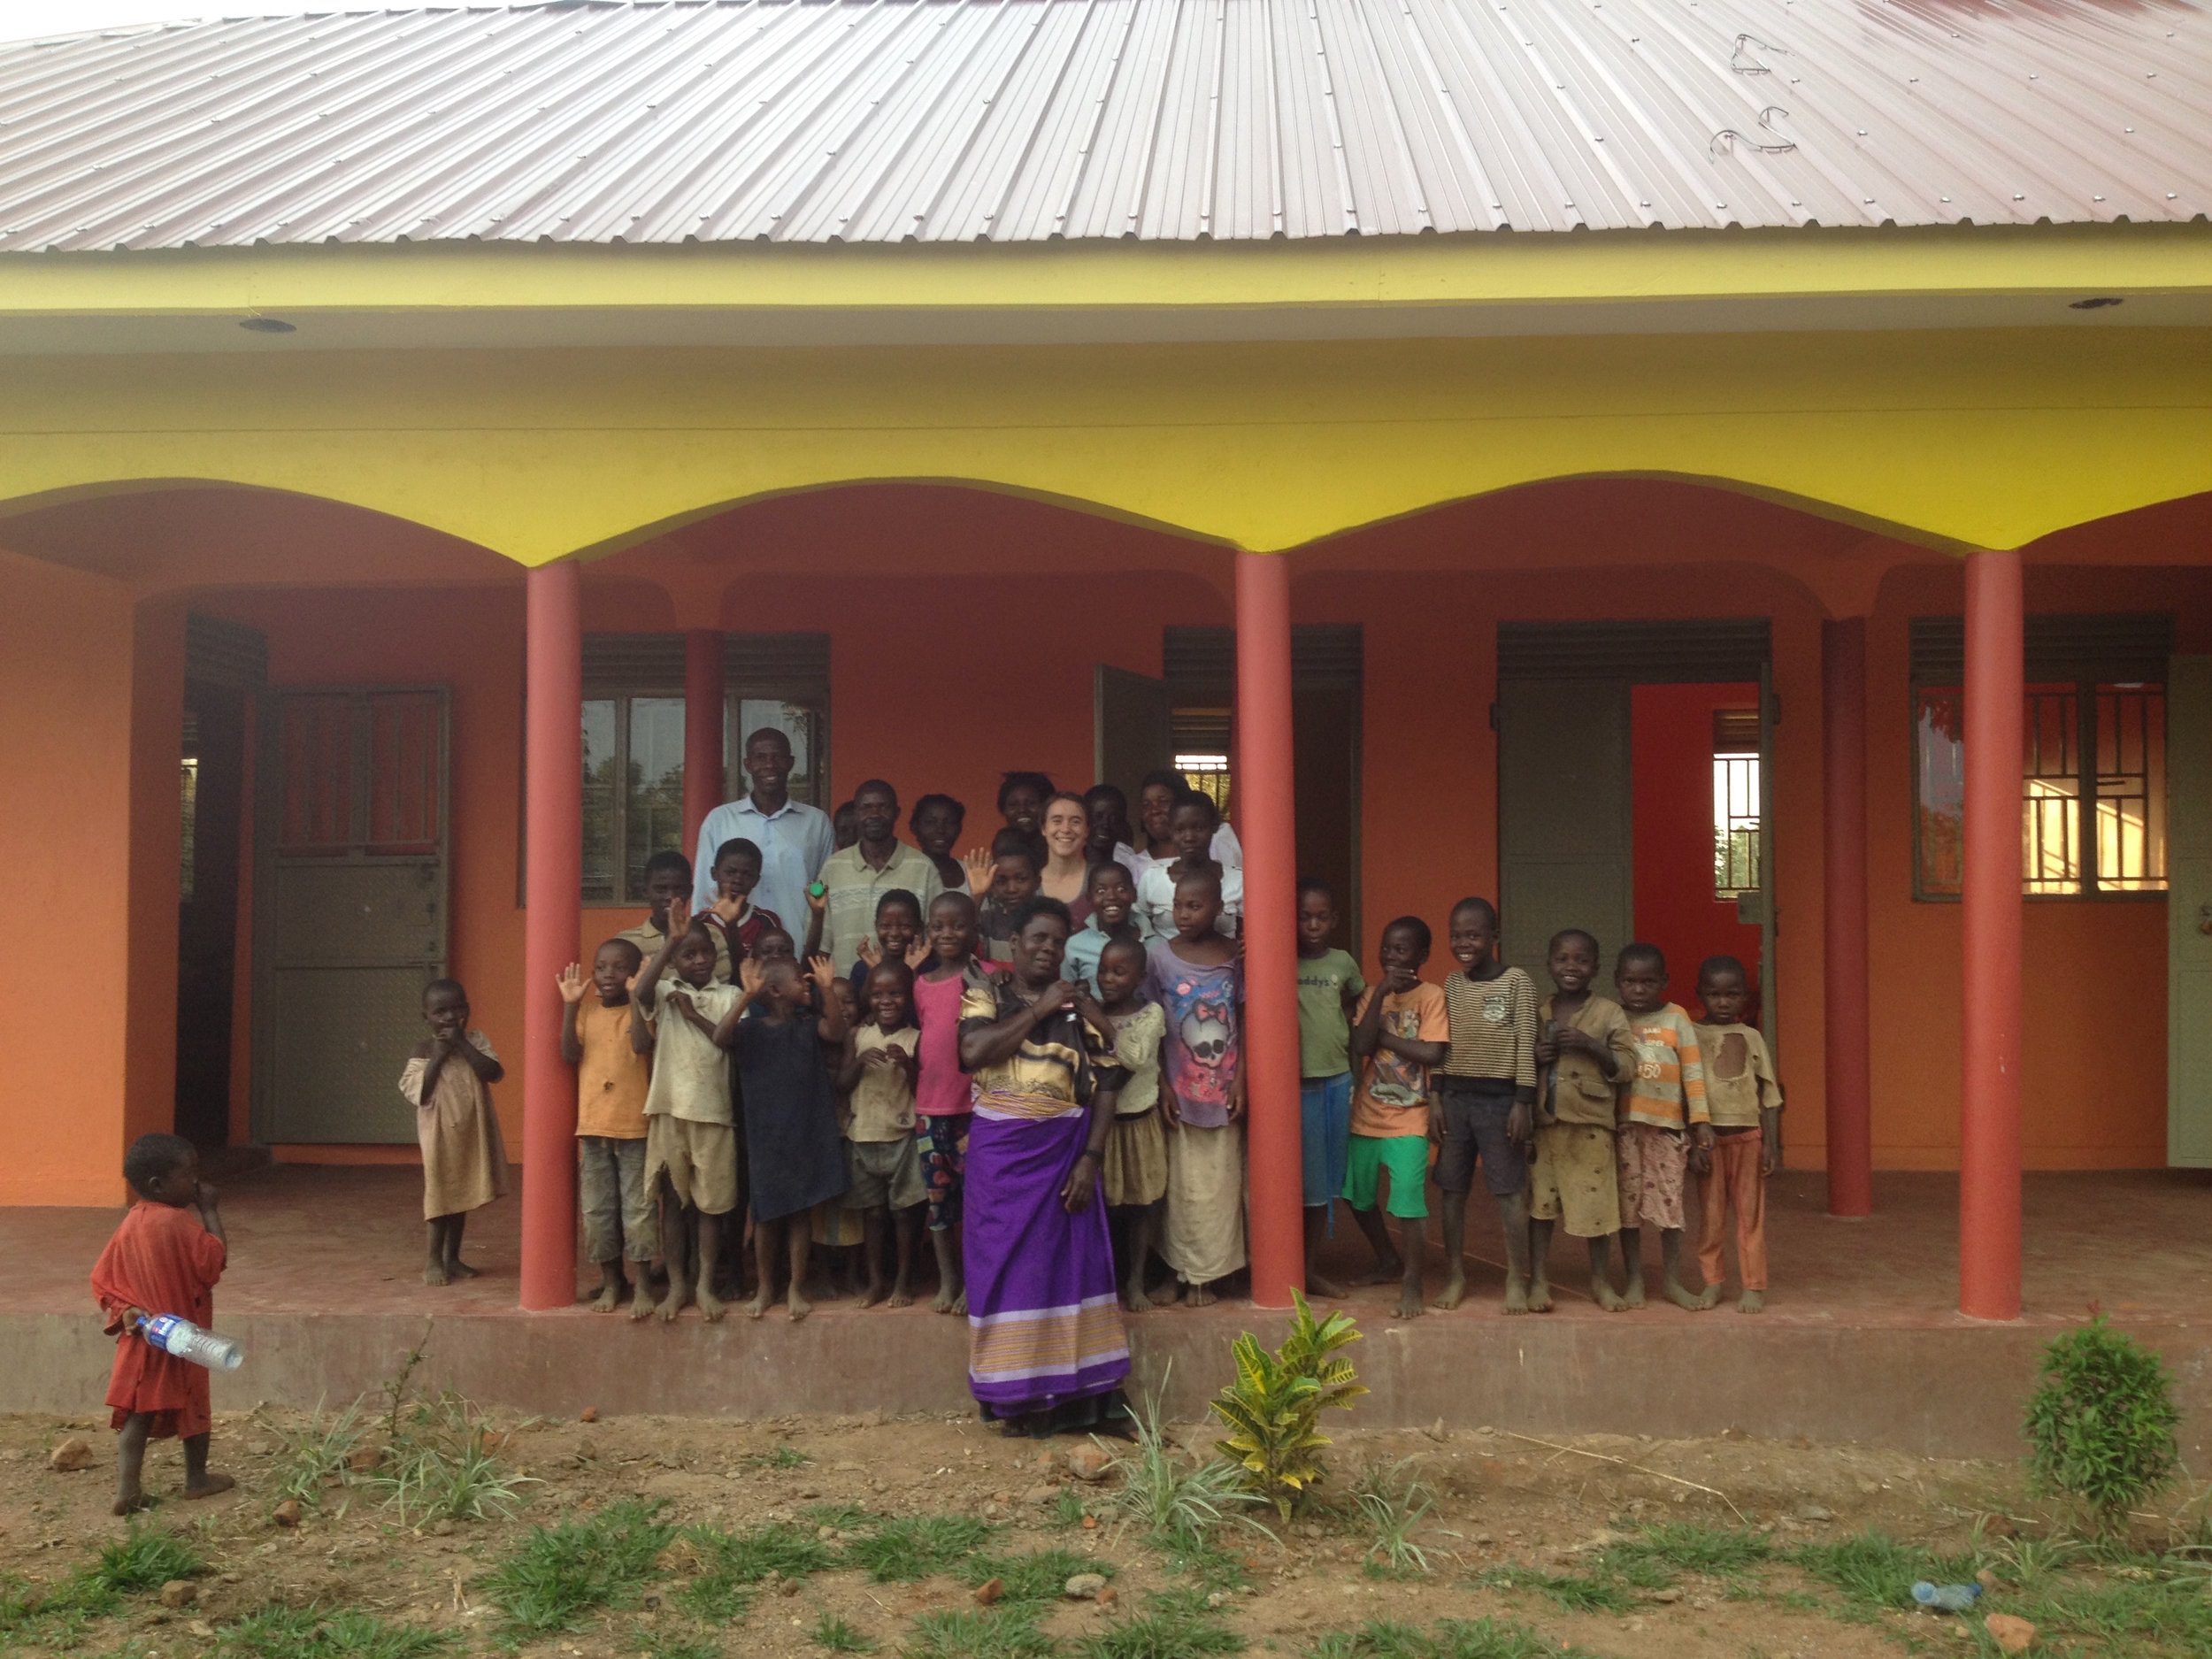 Iganga community members at the fully-operational S.O.U.L. Iganga Community Center